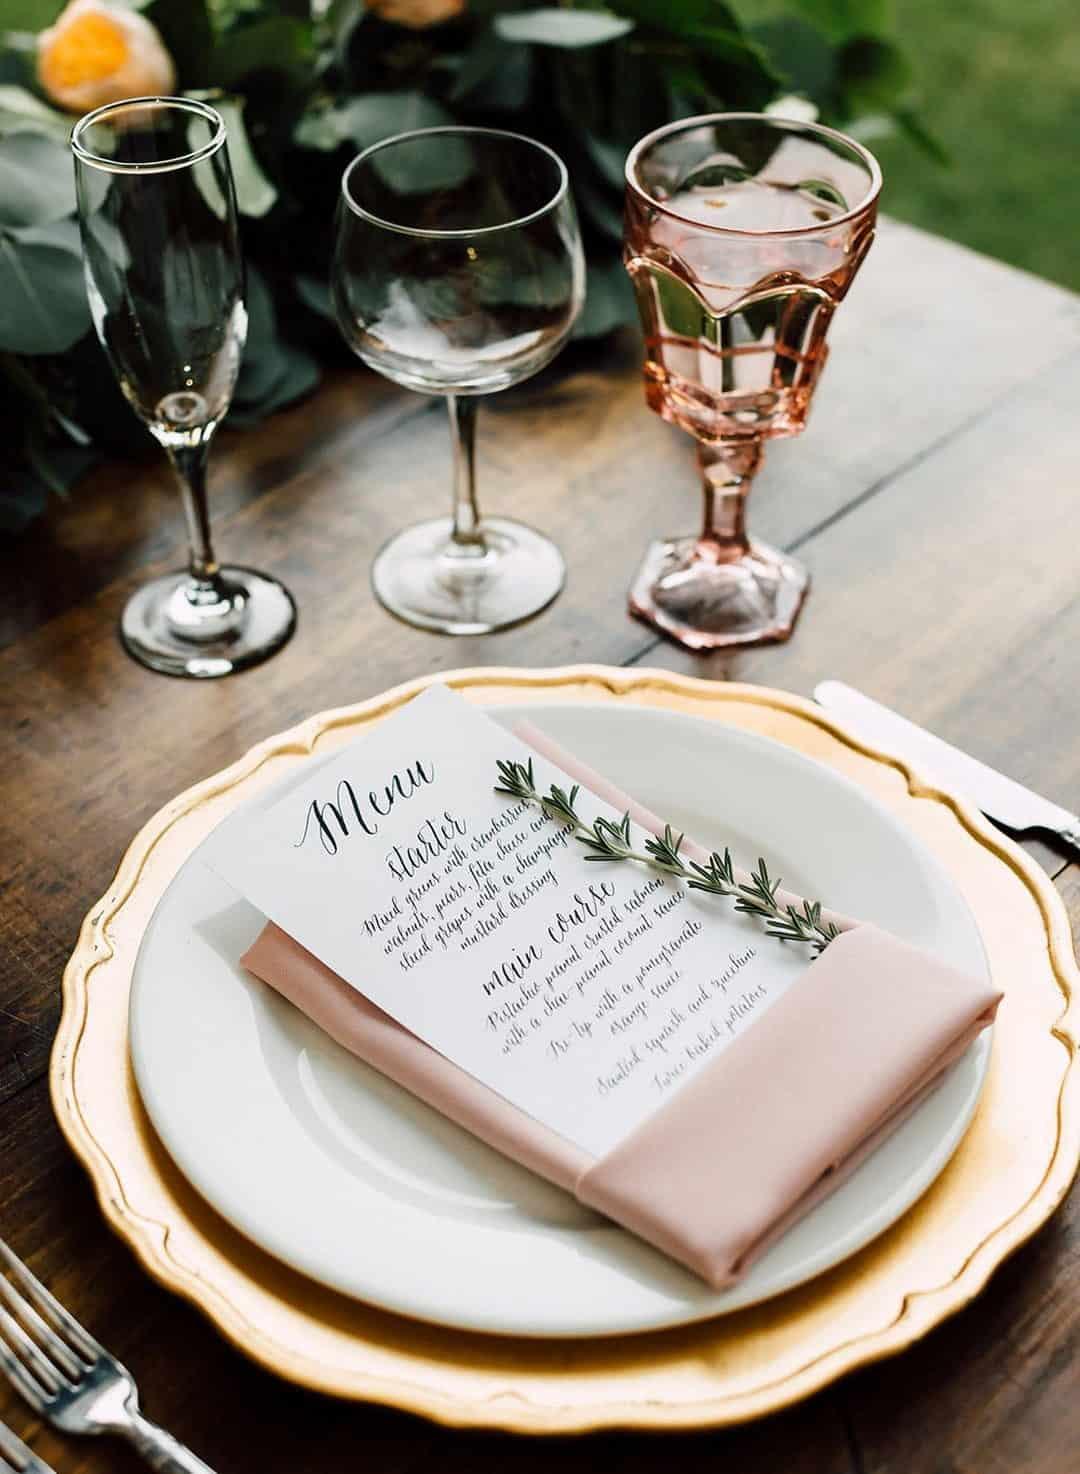 wedding menu on a plate